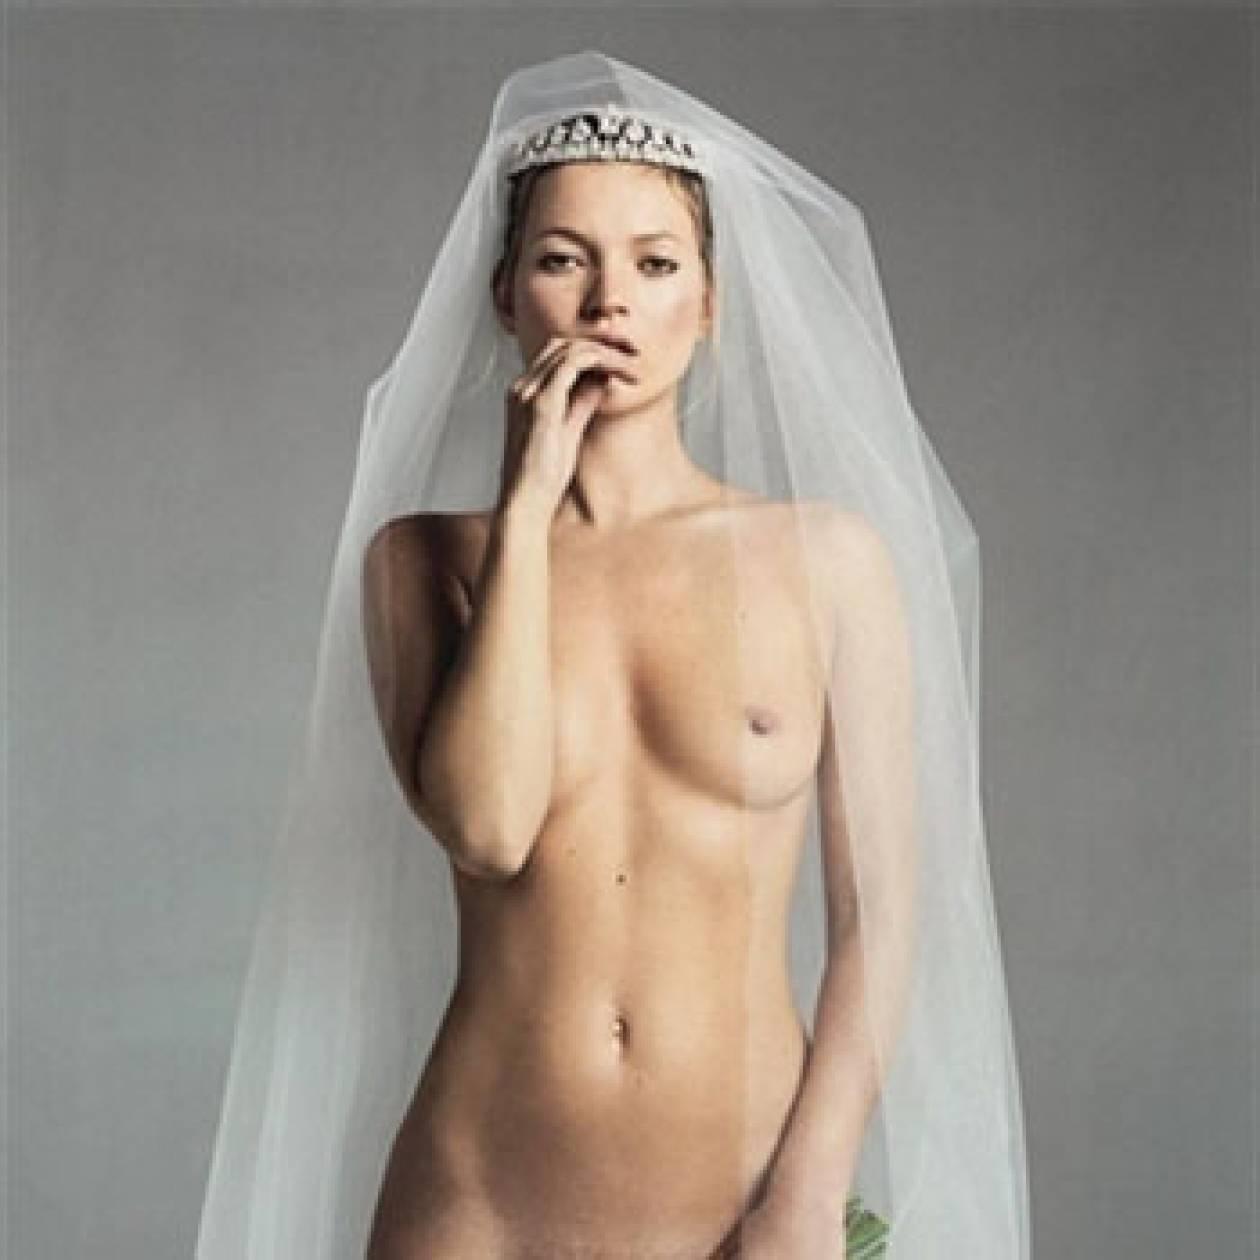 H Kate Moss θα δοκιμάζει νυφικά στο νέο τεύχος της Vogue